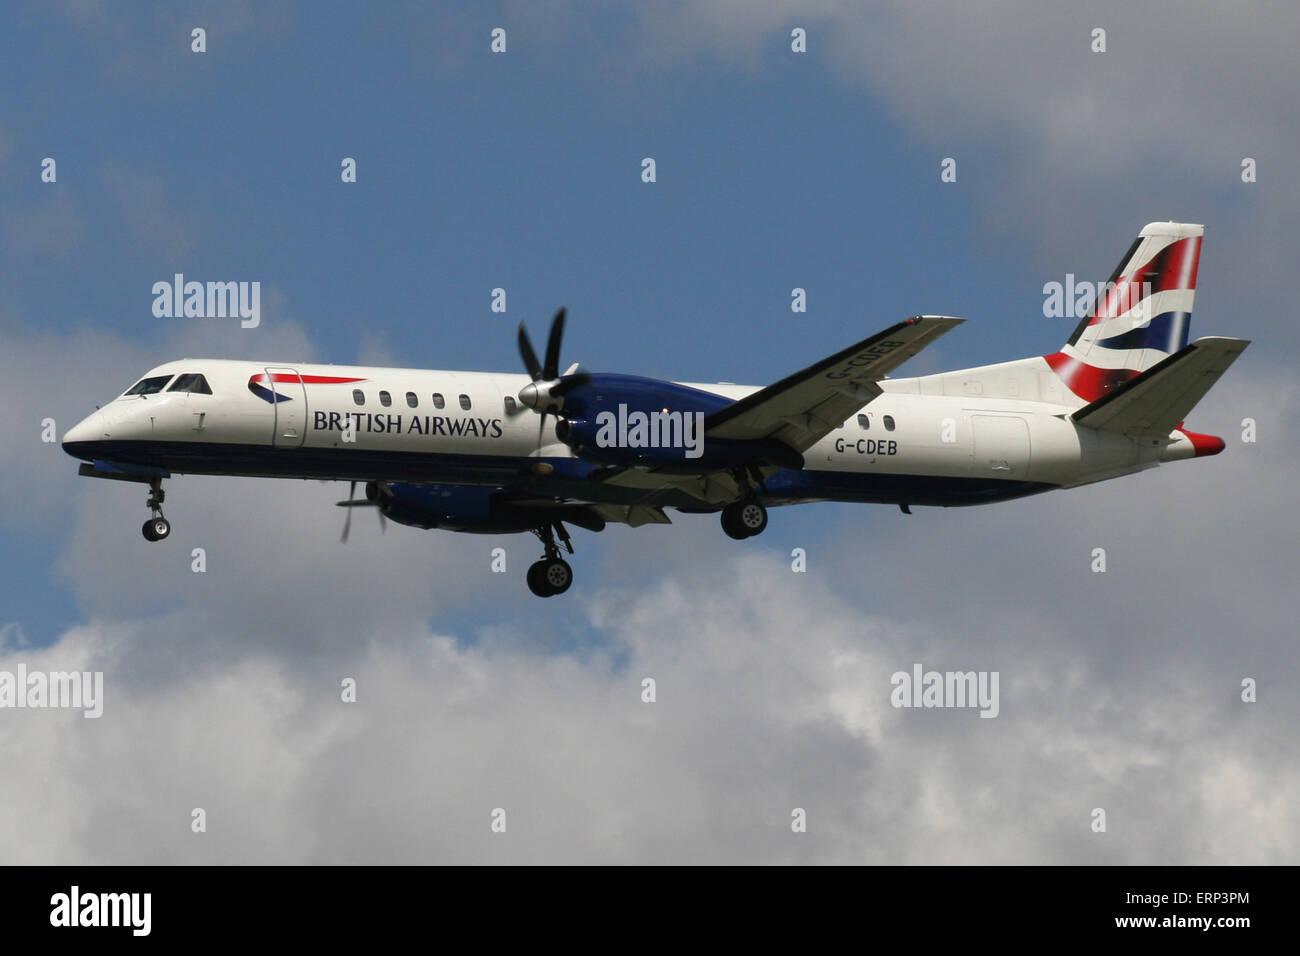 BRITISH AIRWAYS SAAB 2000 - Stock Image